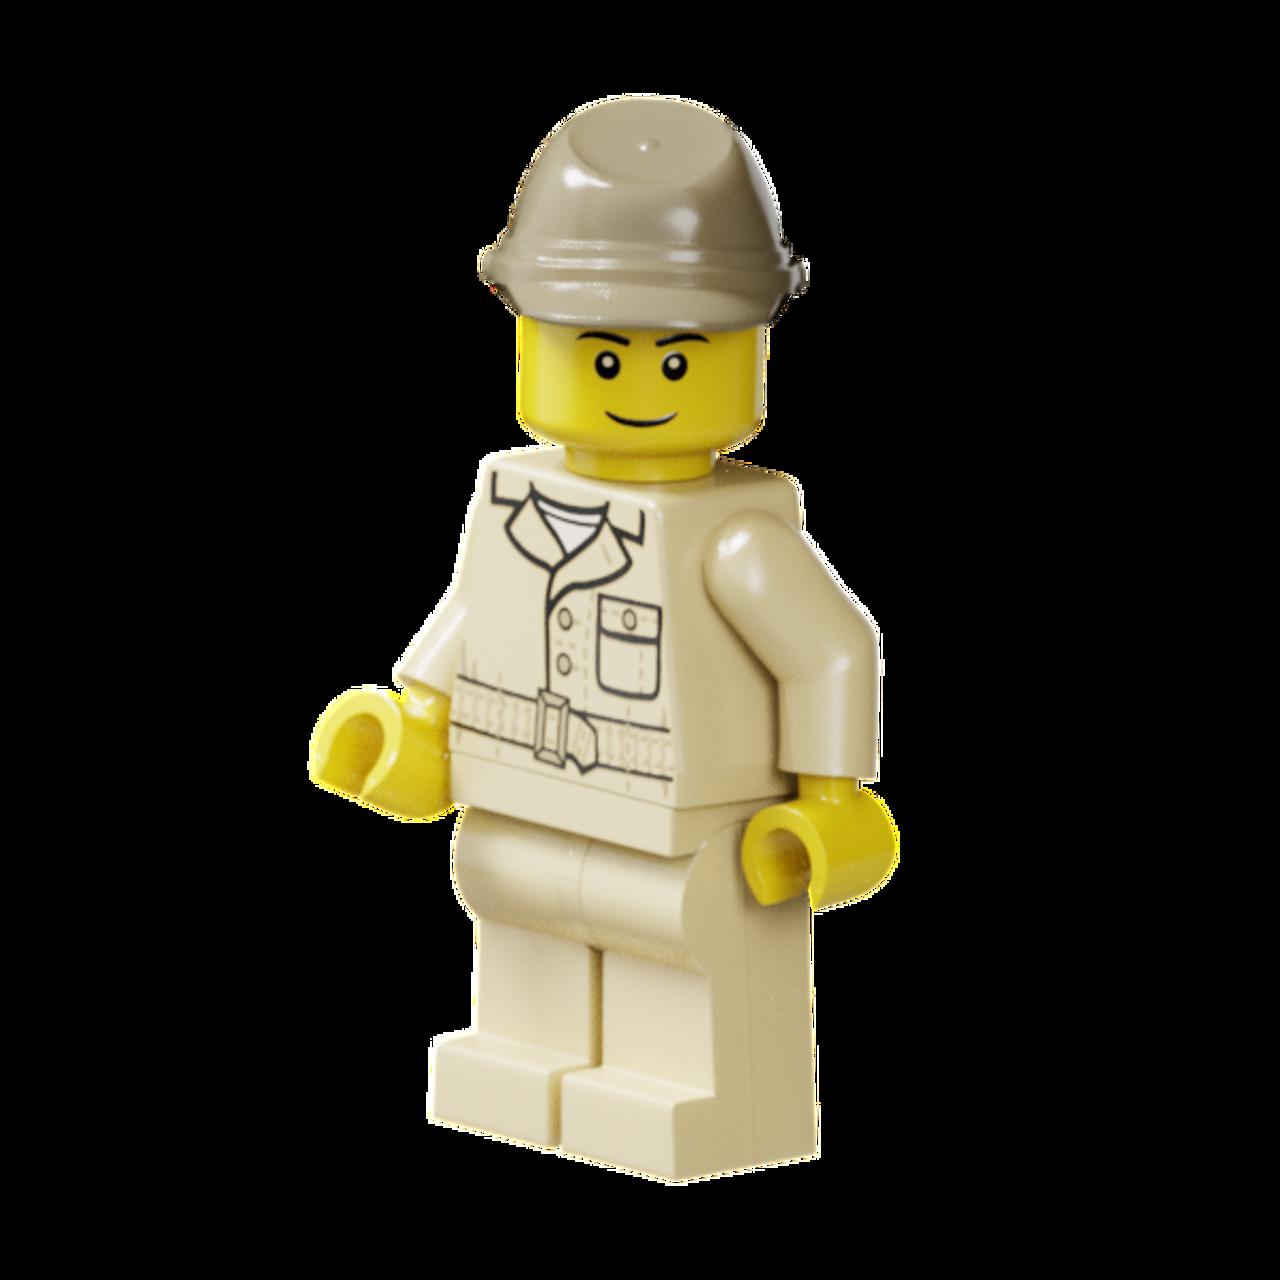 WWII USAAF Ground Crewman